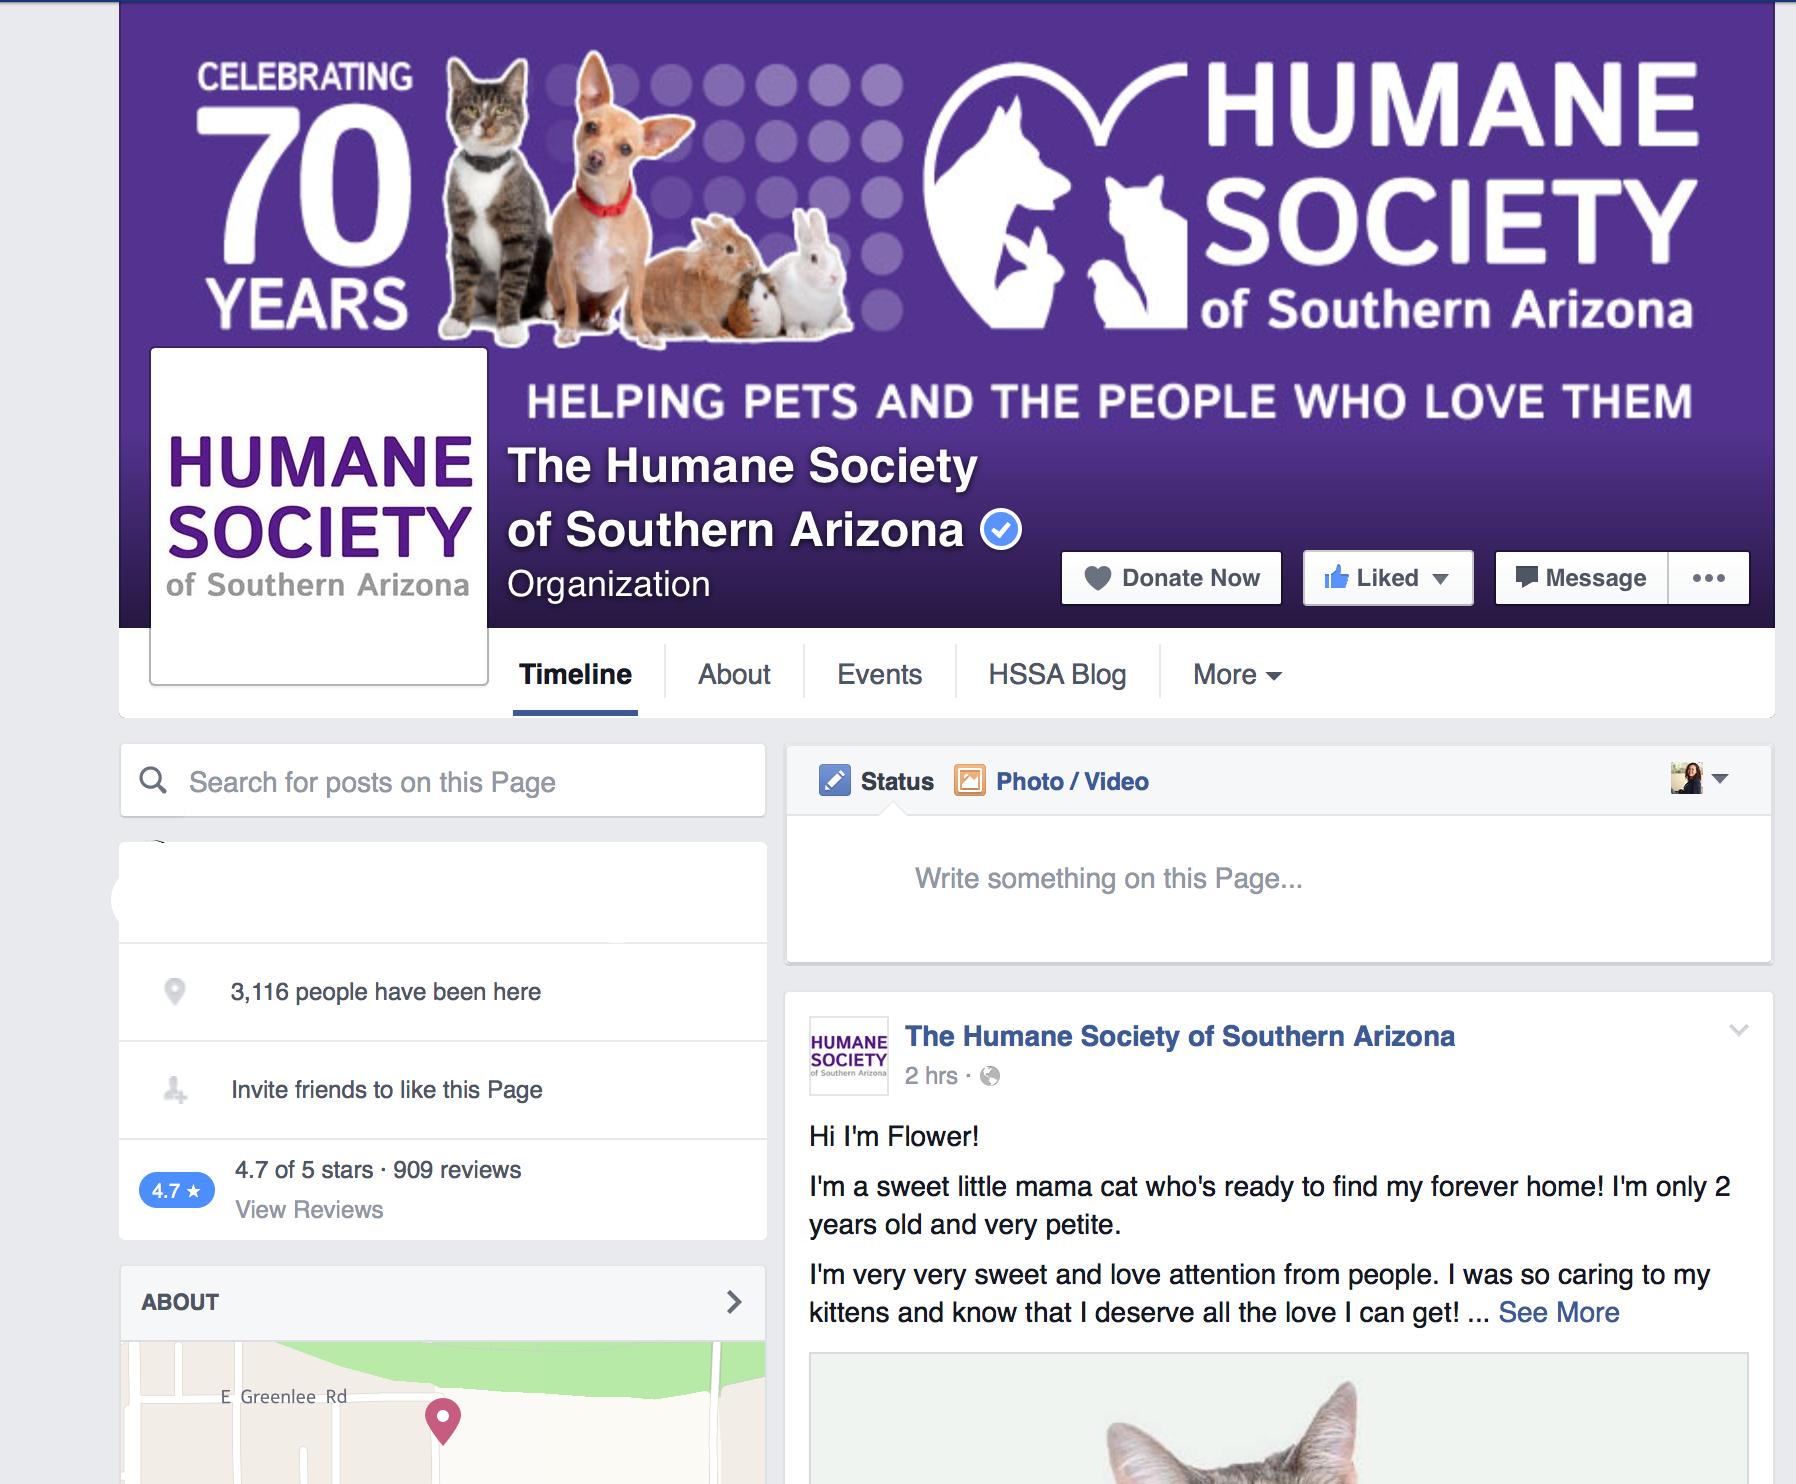 Humane-Society-Southern-Arizona-Facebook